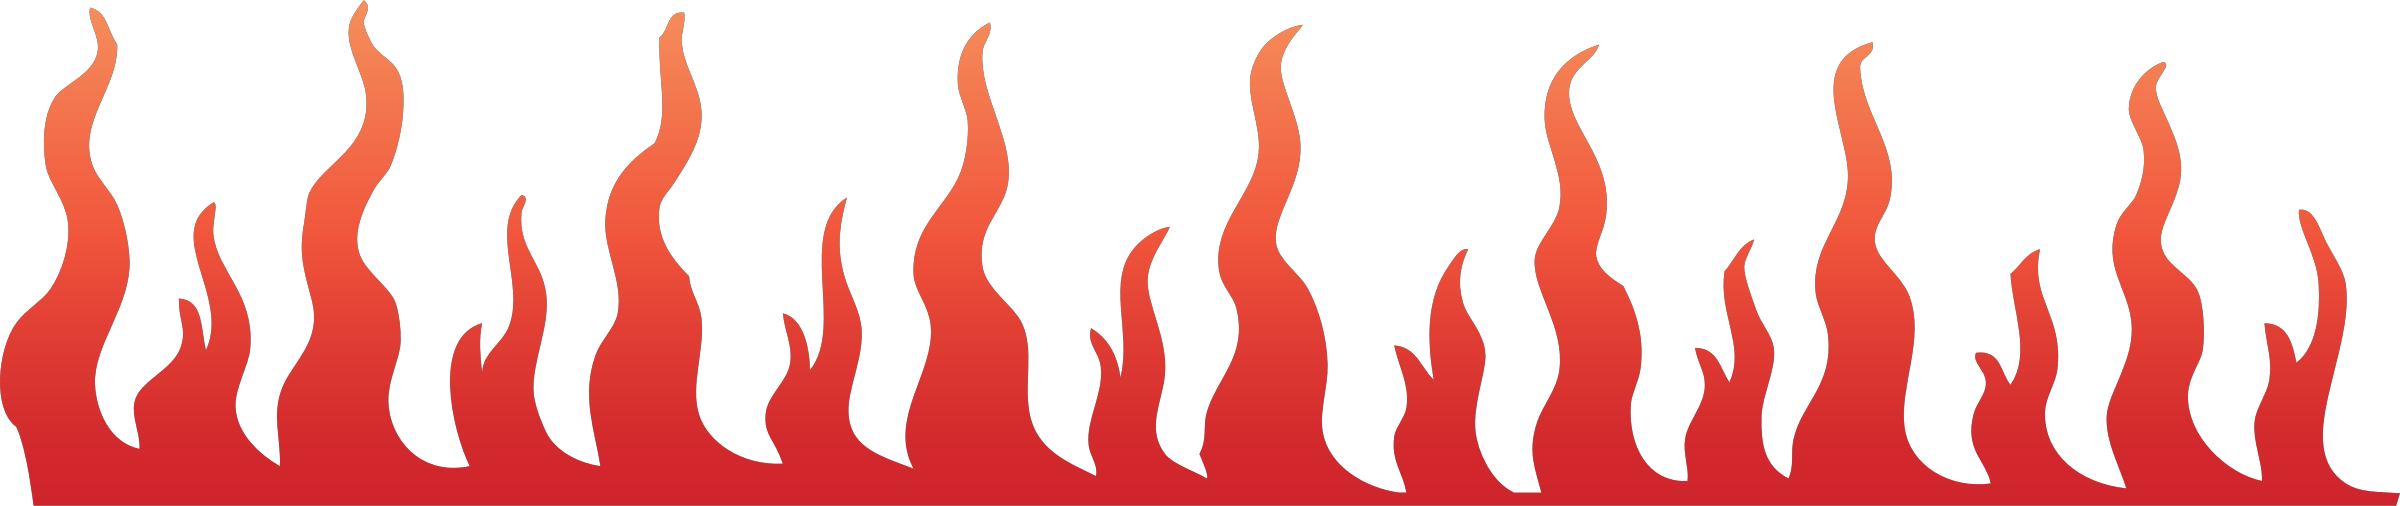 Flames clipart line flames Flames flames Clipart